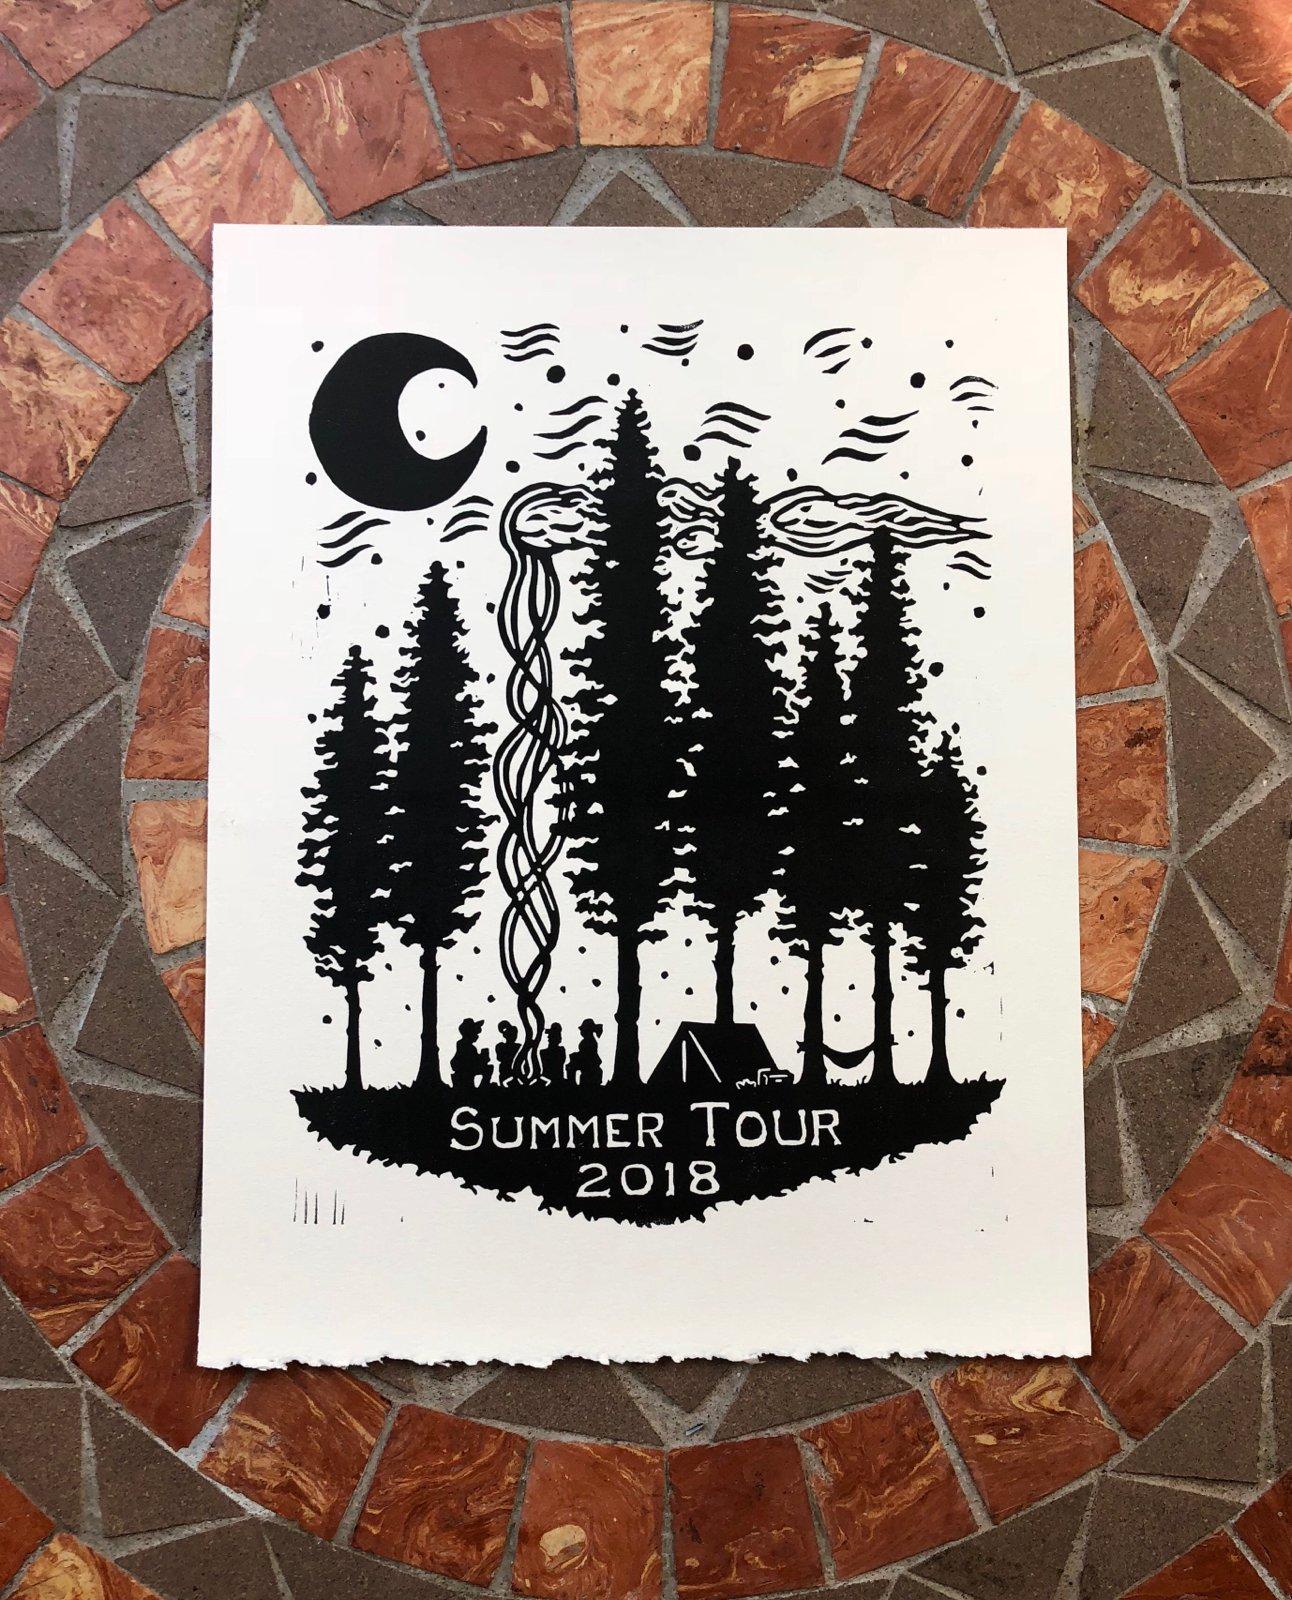 Image of Phish Summer Tour print